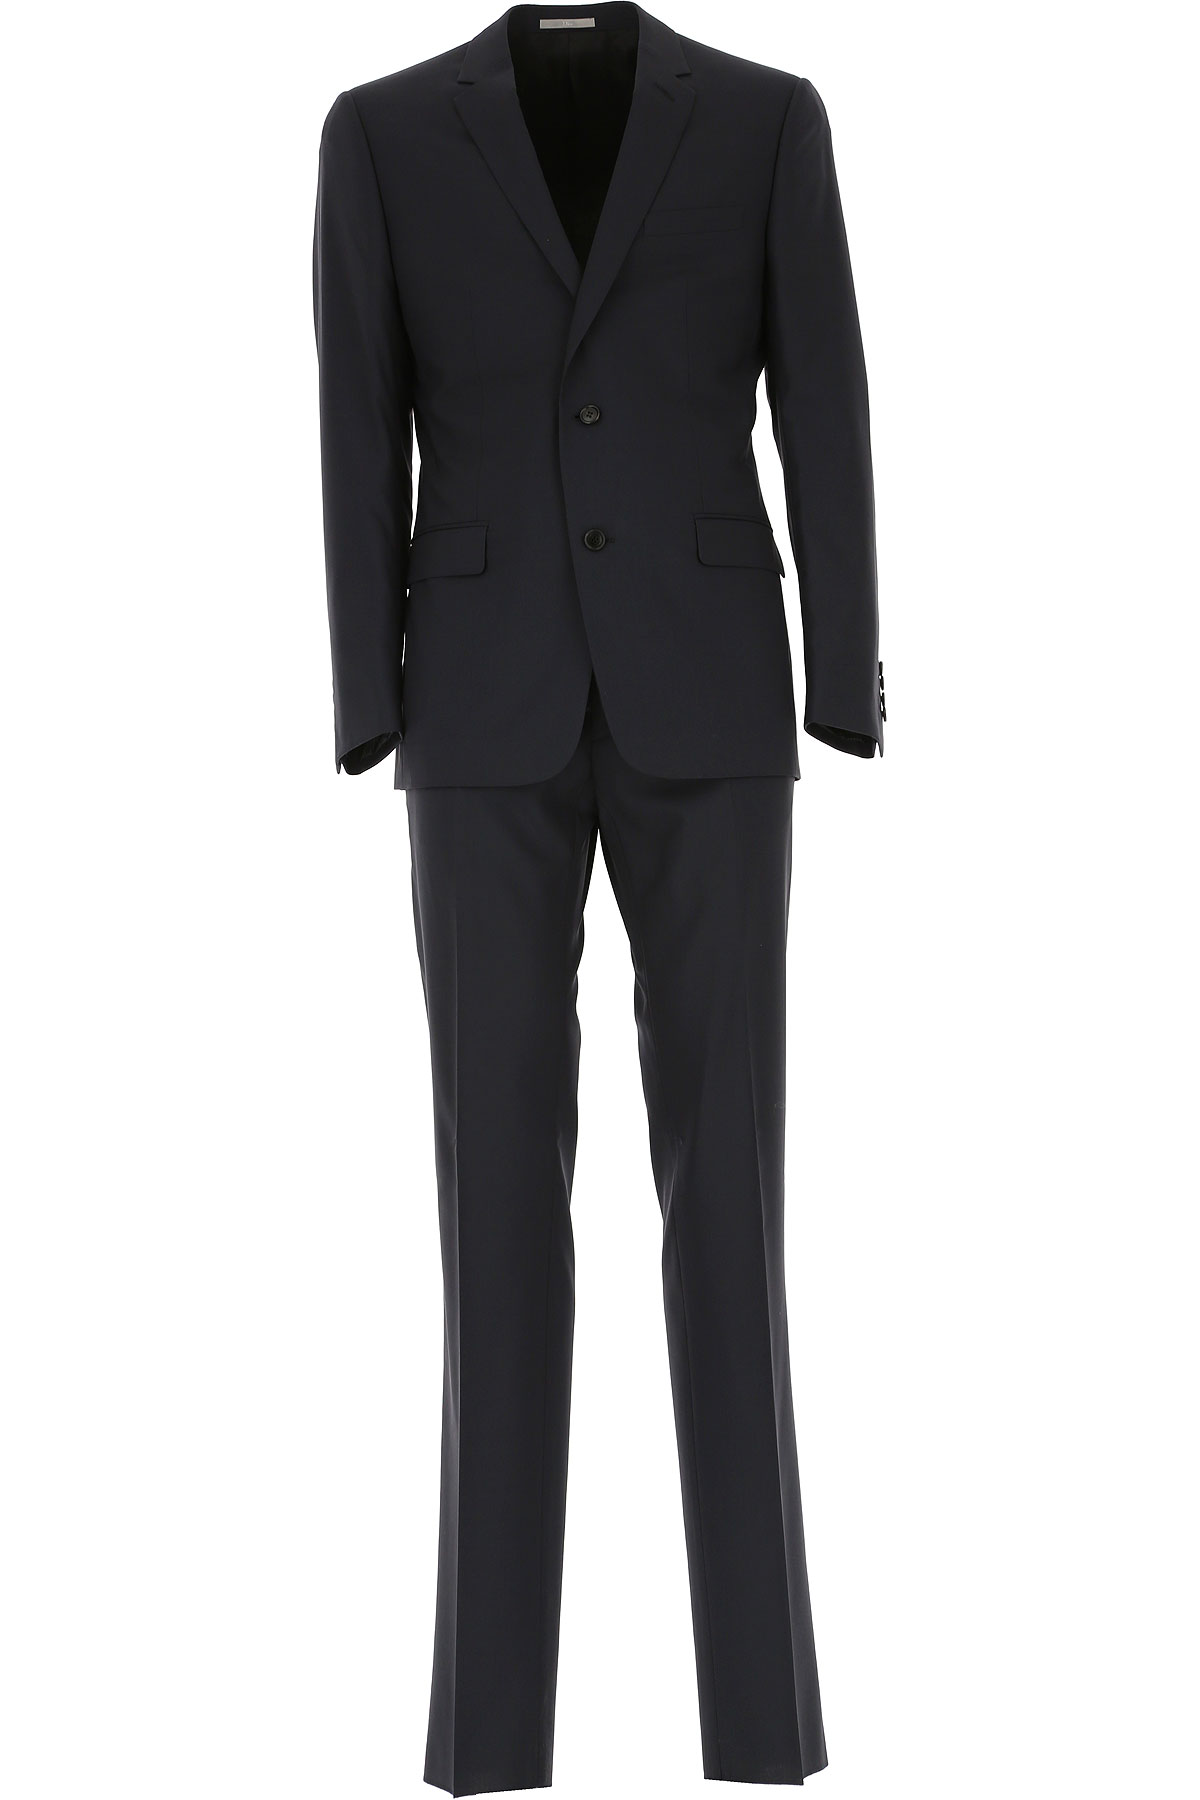 Image of Christian Dior Men's Suit, Blue Marine, Virgin wool, 2017, L M